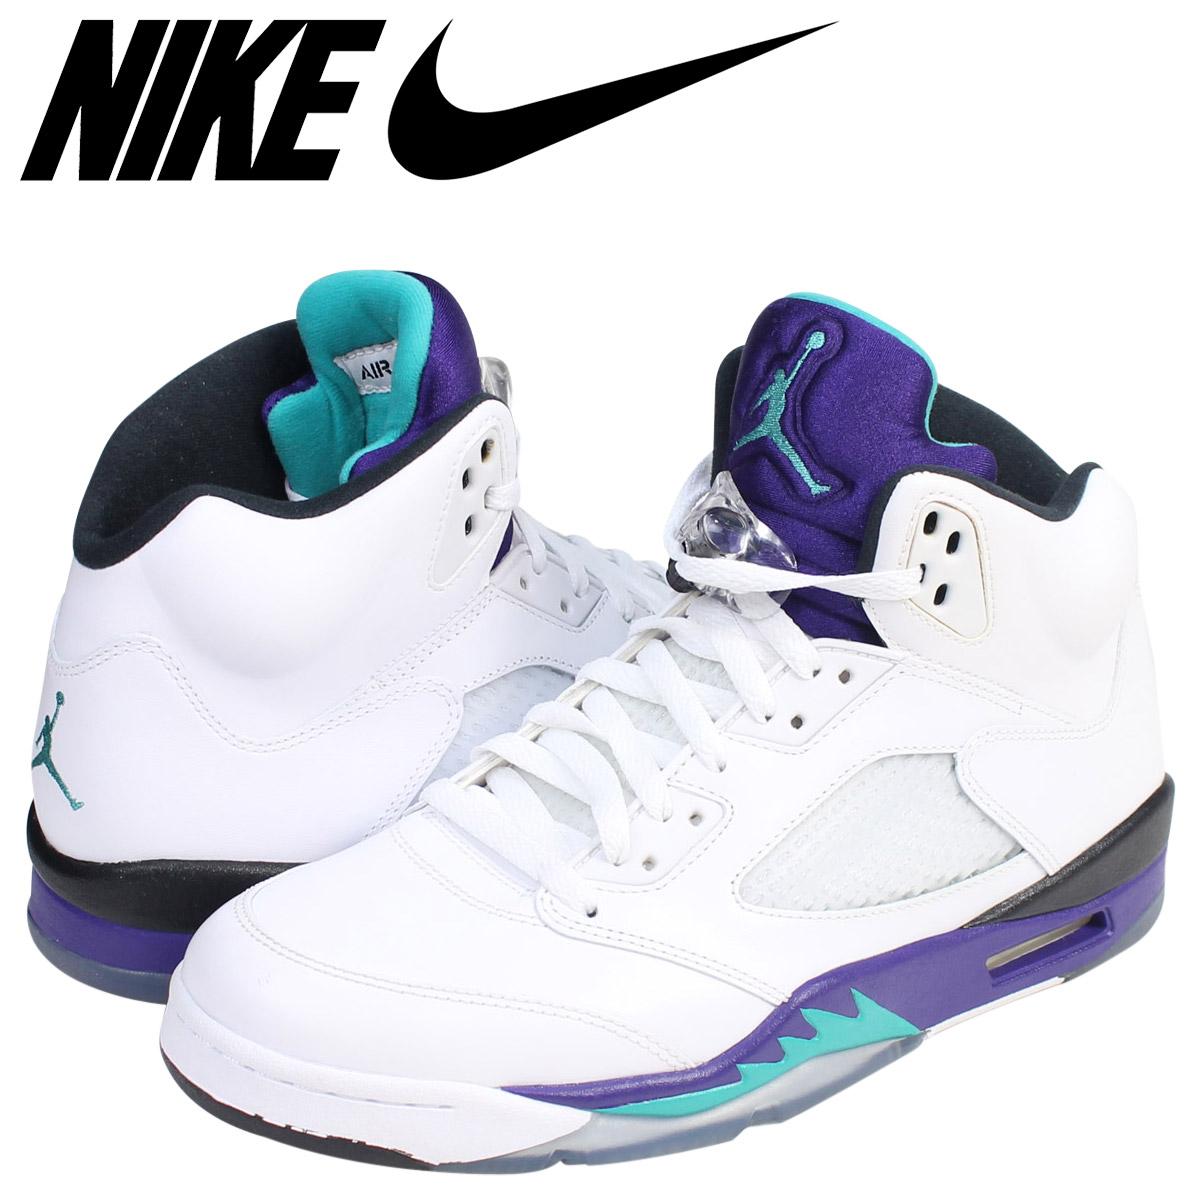 1b8480cd24b NIKE Nike Air Jordan 5 nostalgic sneakers AIR JORDAN 5 RETRO GRAPE 136,027- 108 men's ...